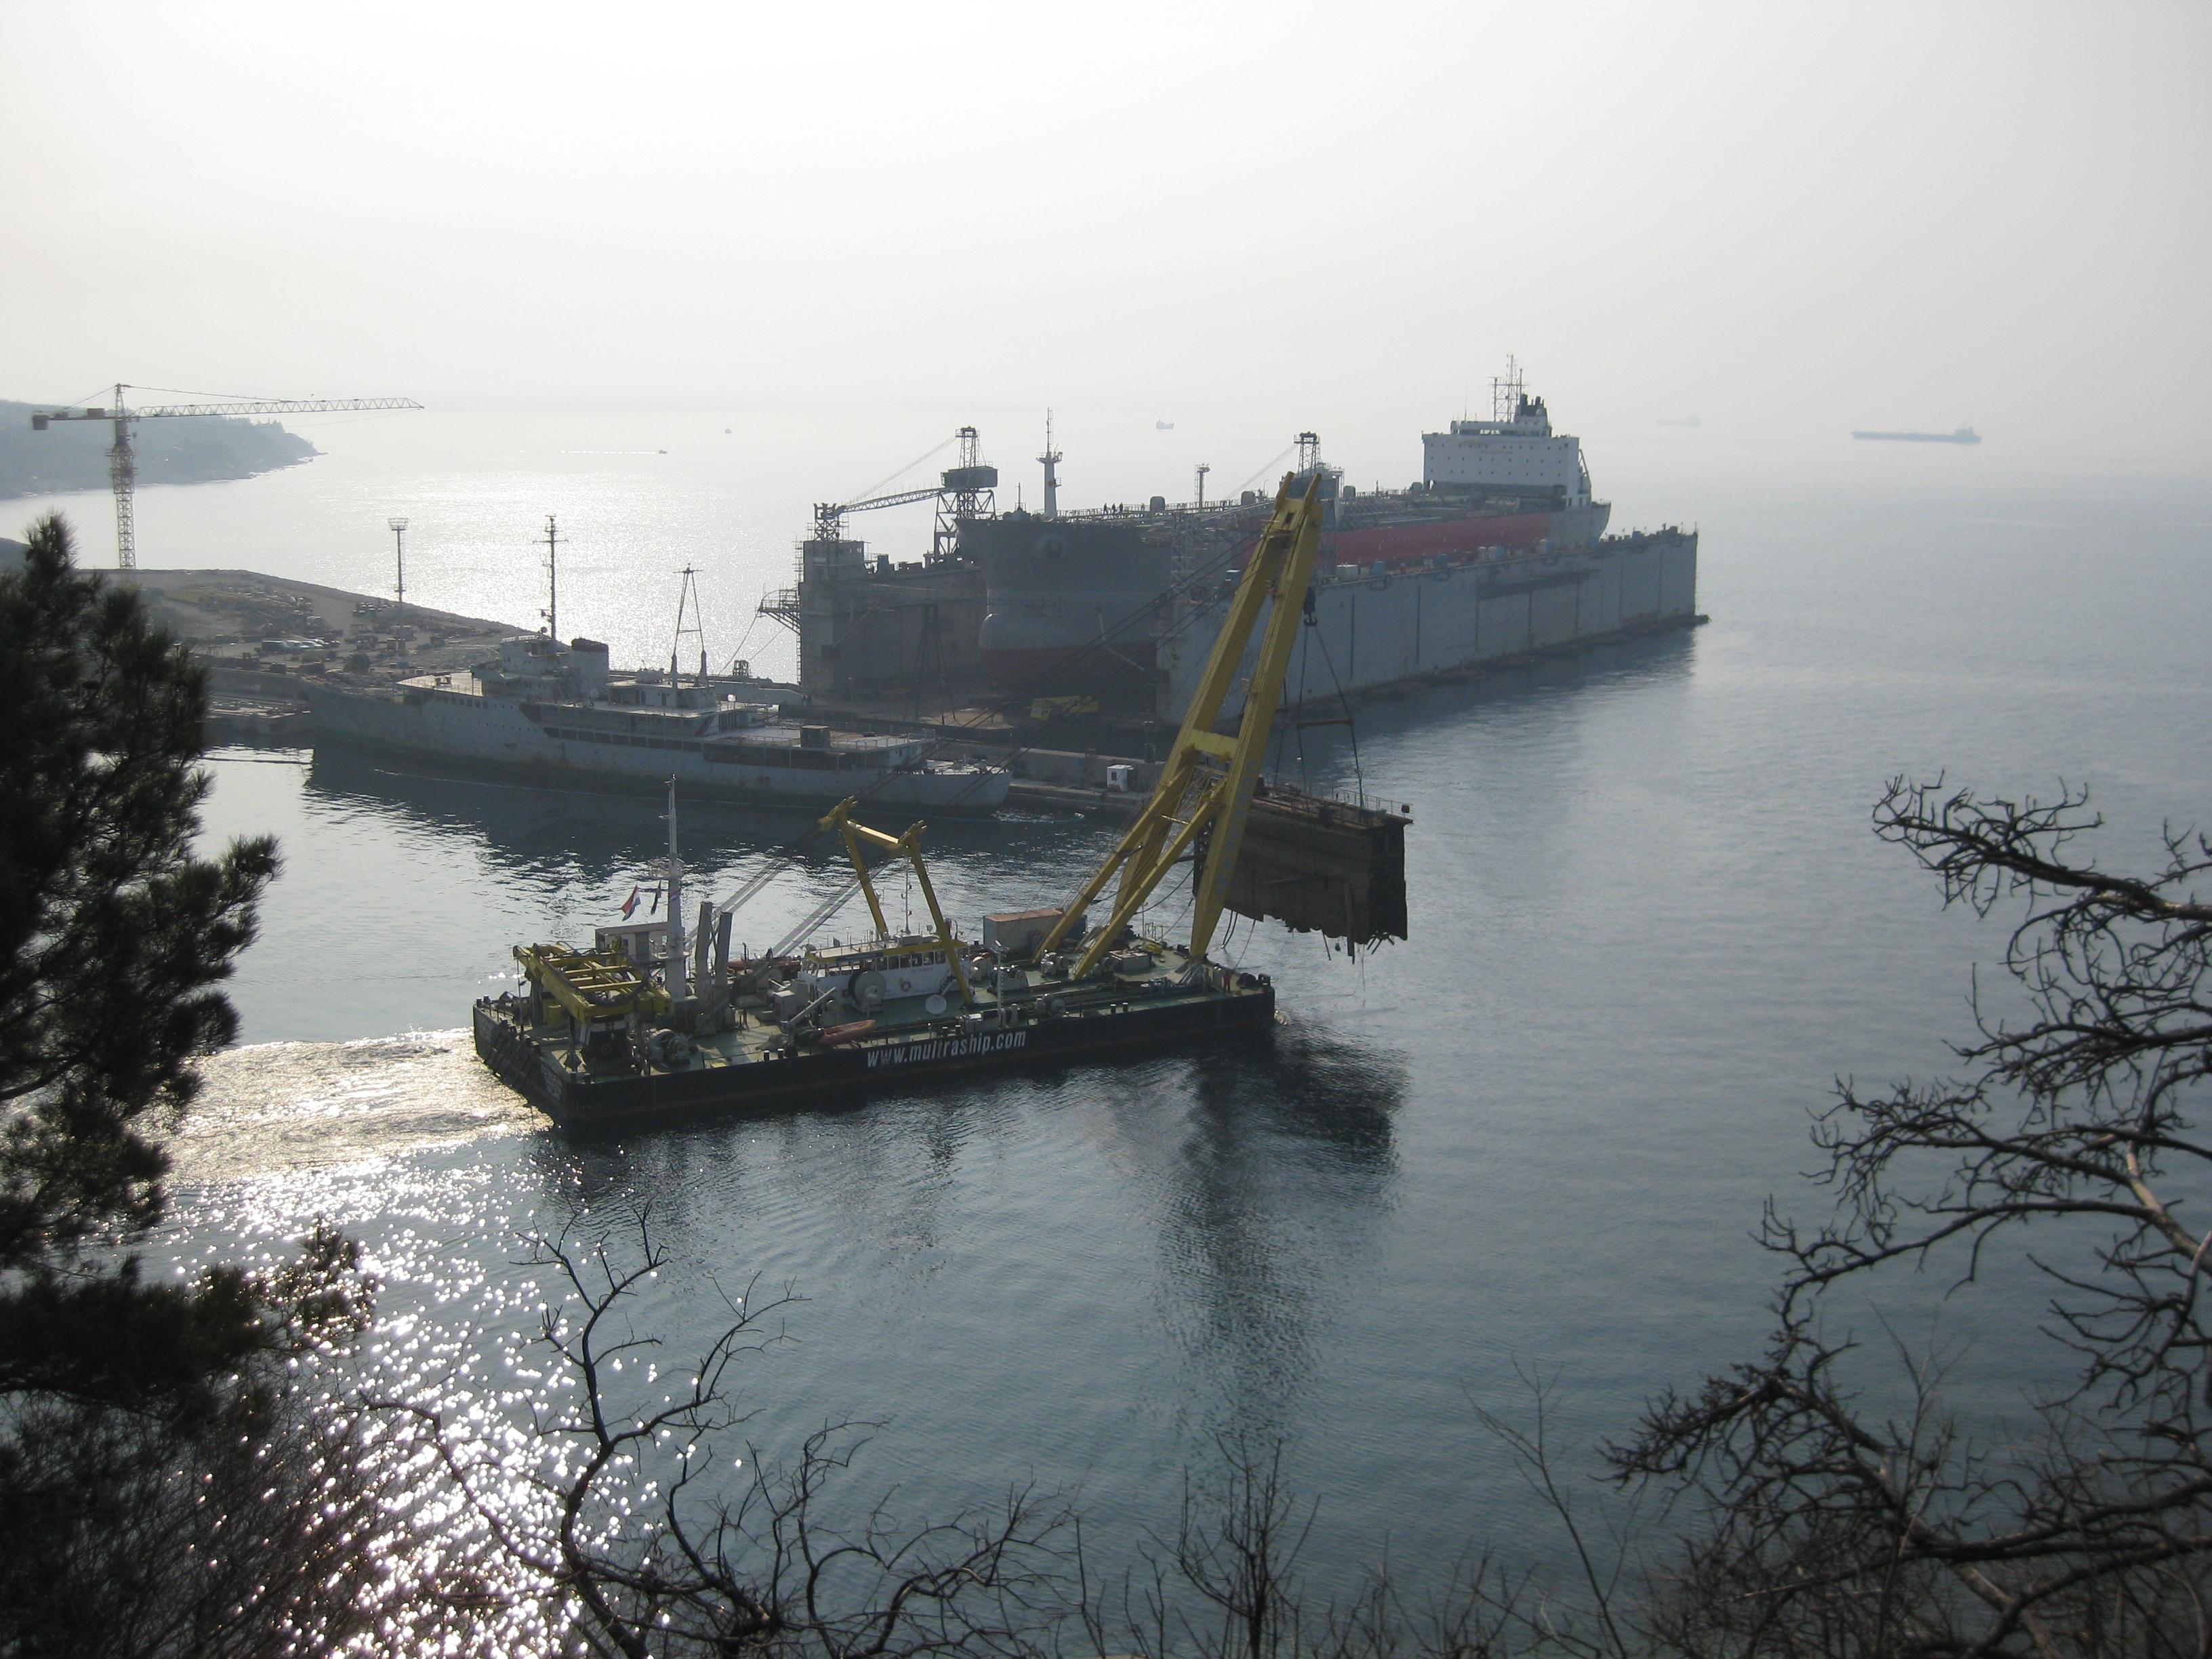 Drydock salvage Reijka